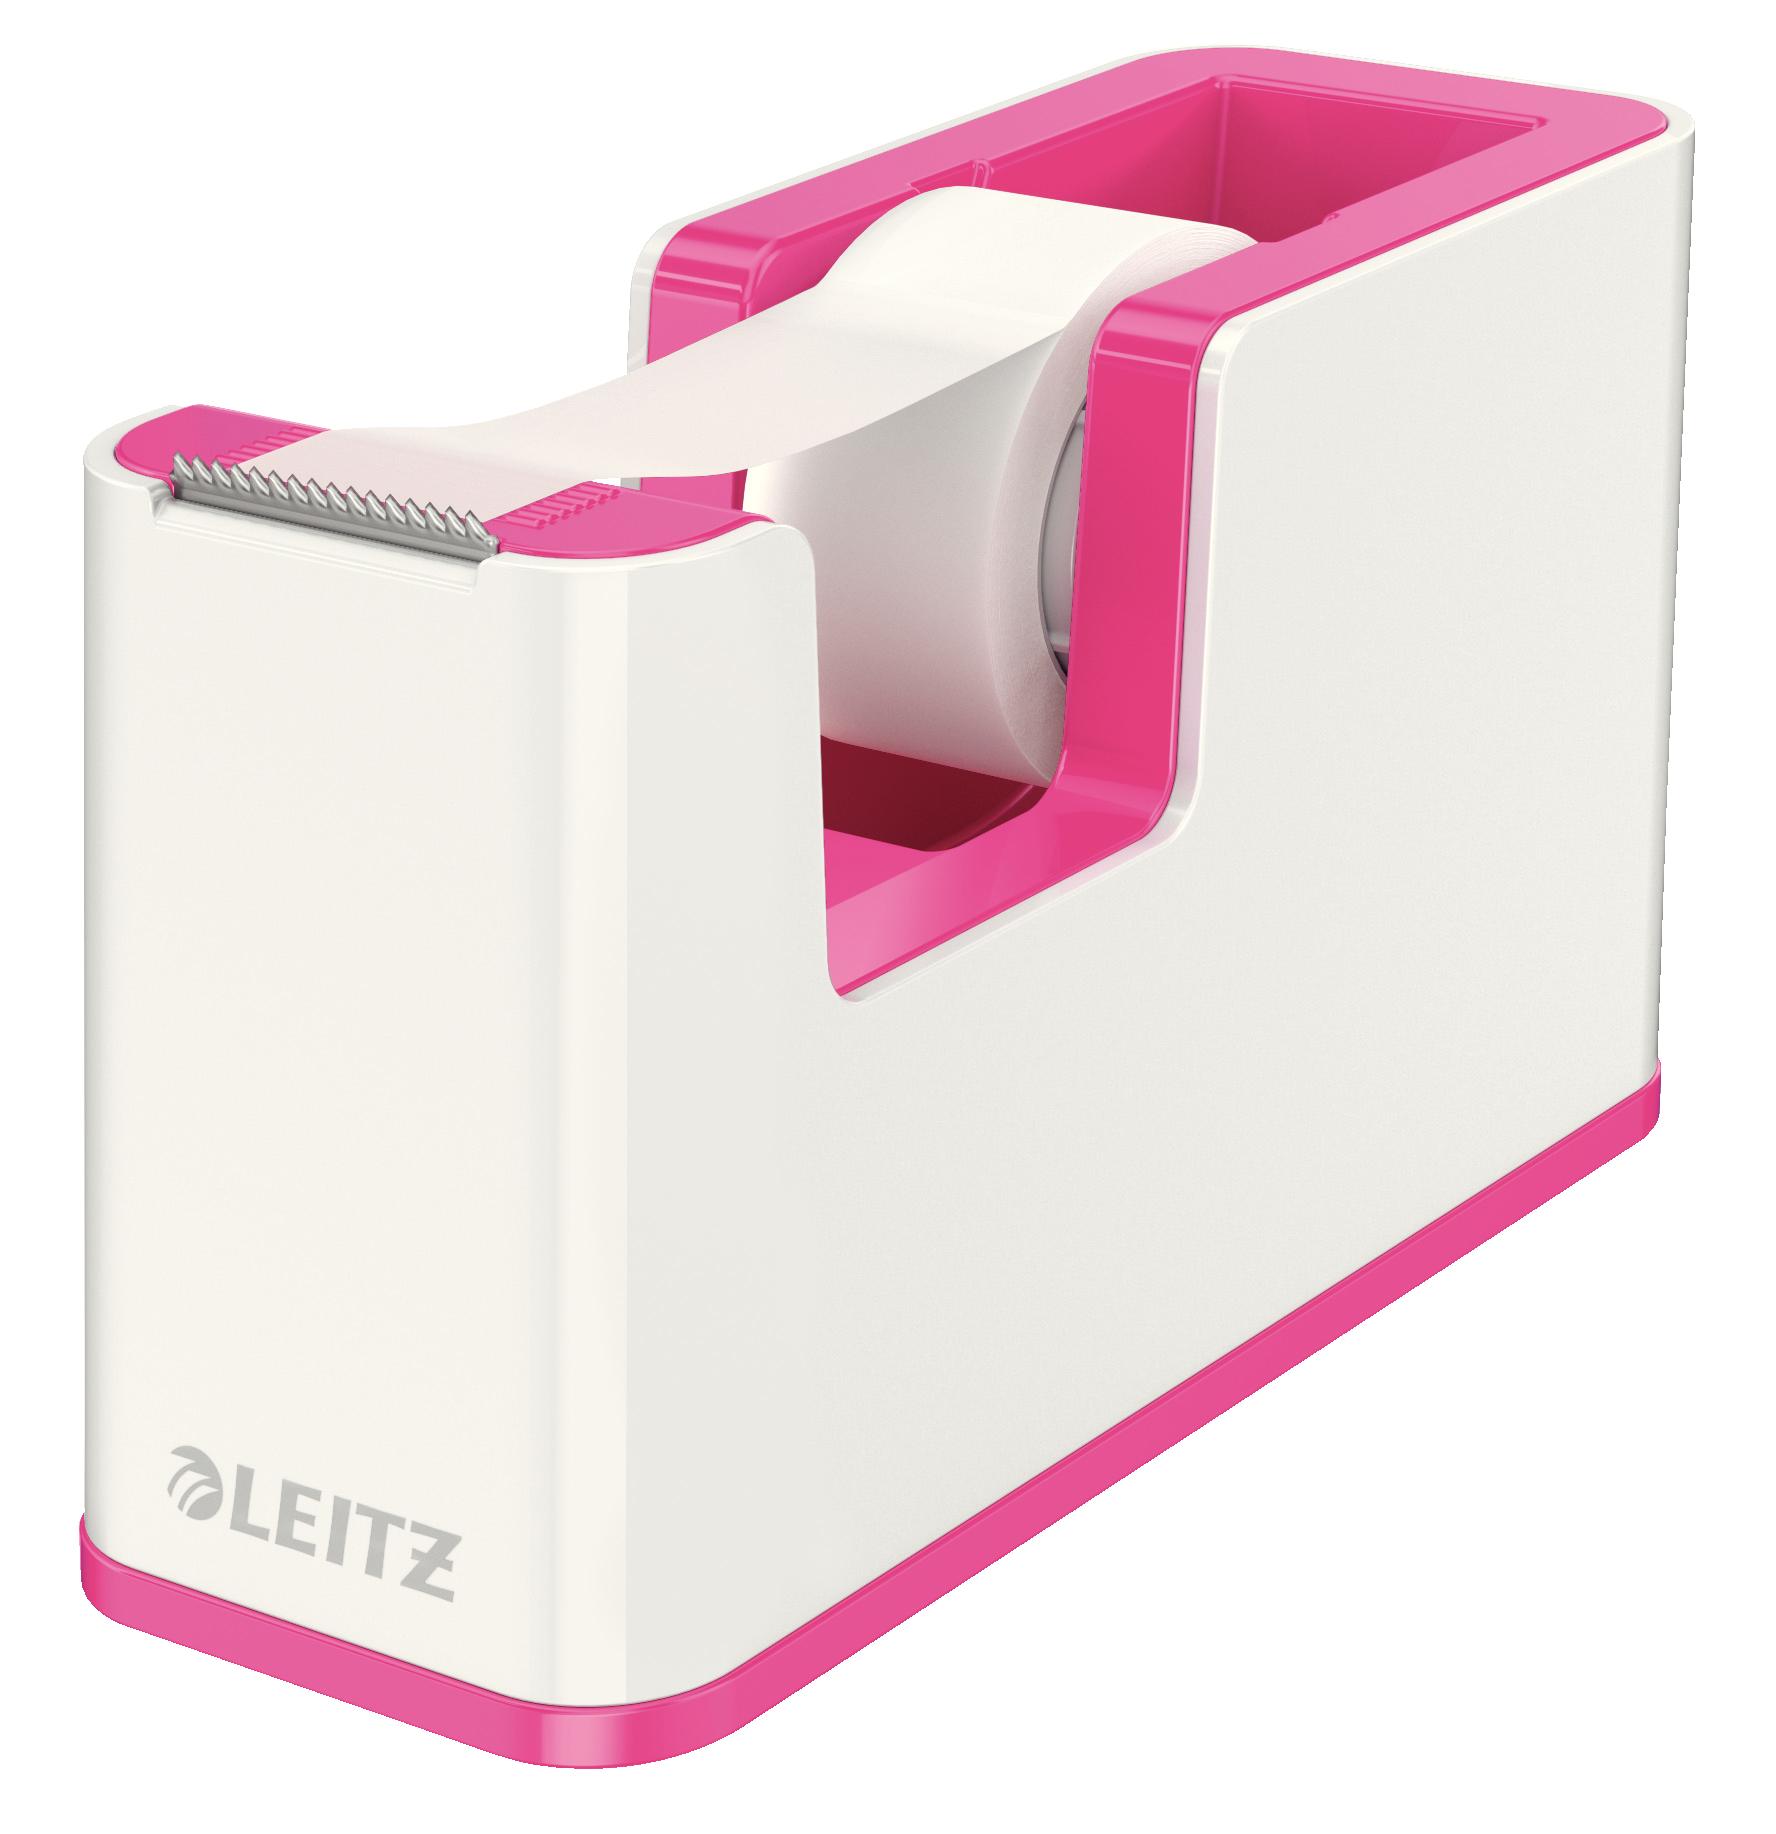 Leitz WOW Duo Colour Tape Dispenser Pink 53641023 (PK1)